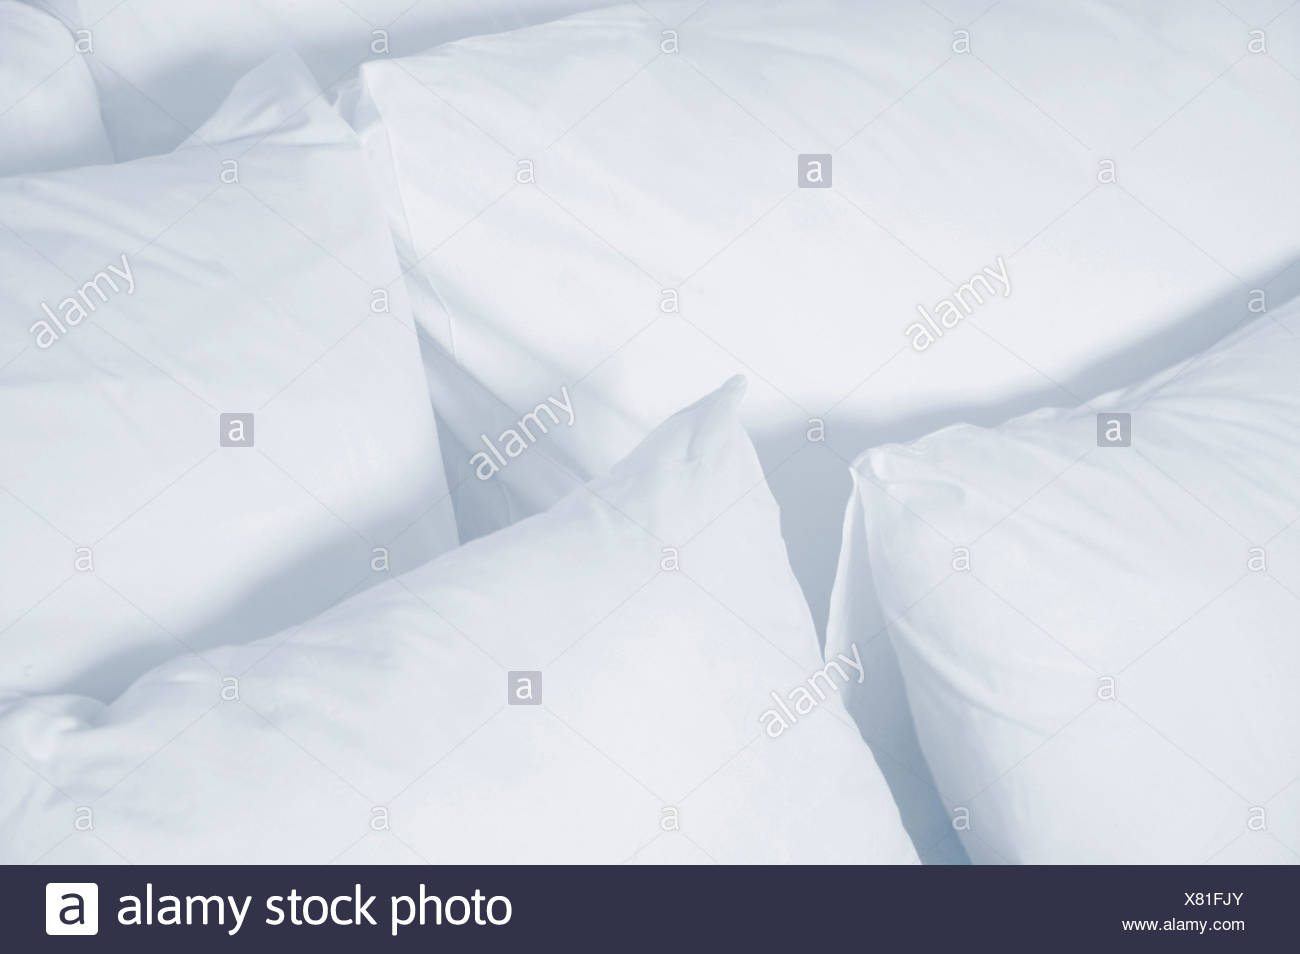 Fresh clean pillows - Stock Image